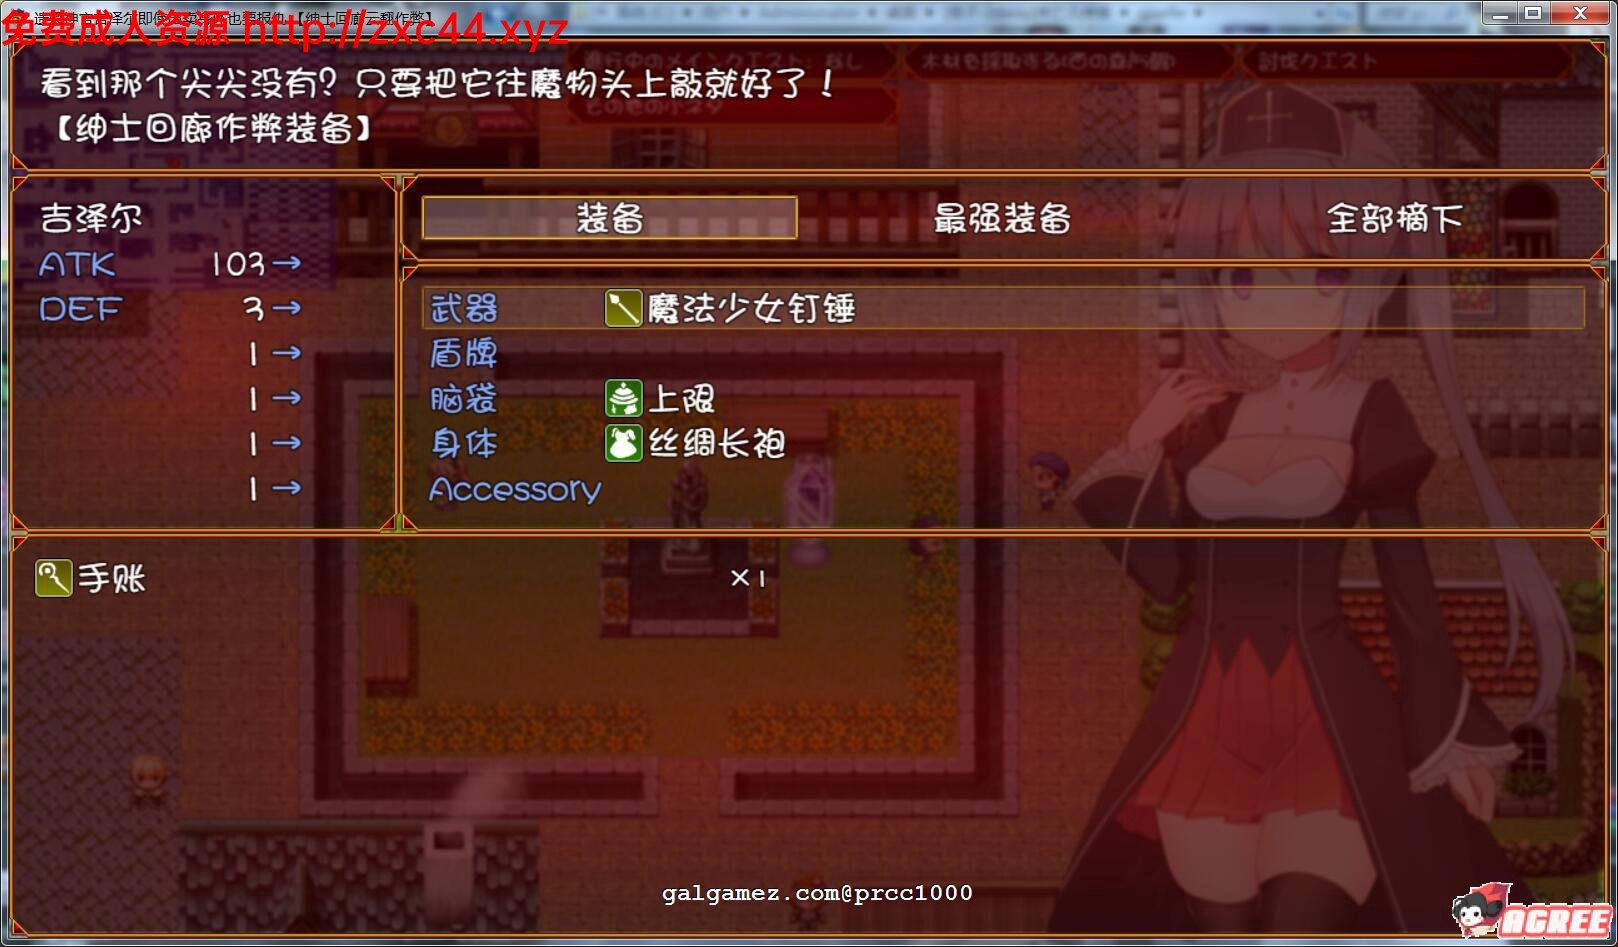 【ARPG/汉化】遗孀神官吉泽尔即使出卖身体也要报仇 作弊汉化版【600M】 6